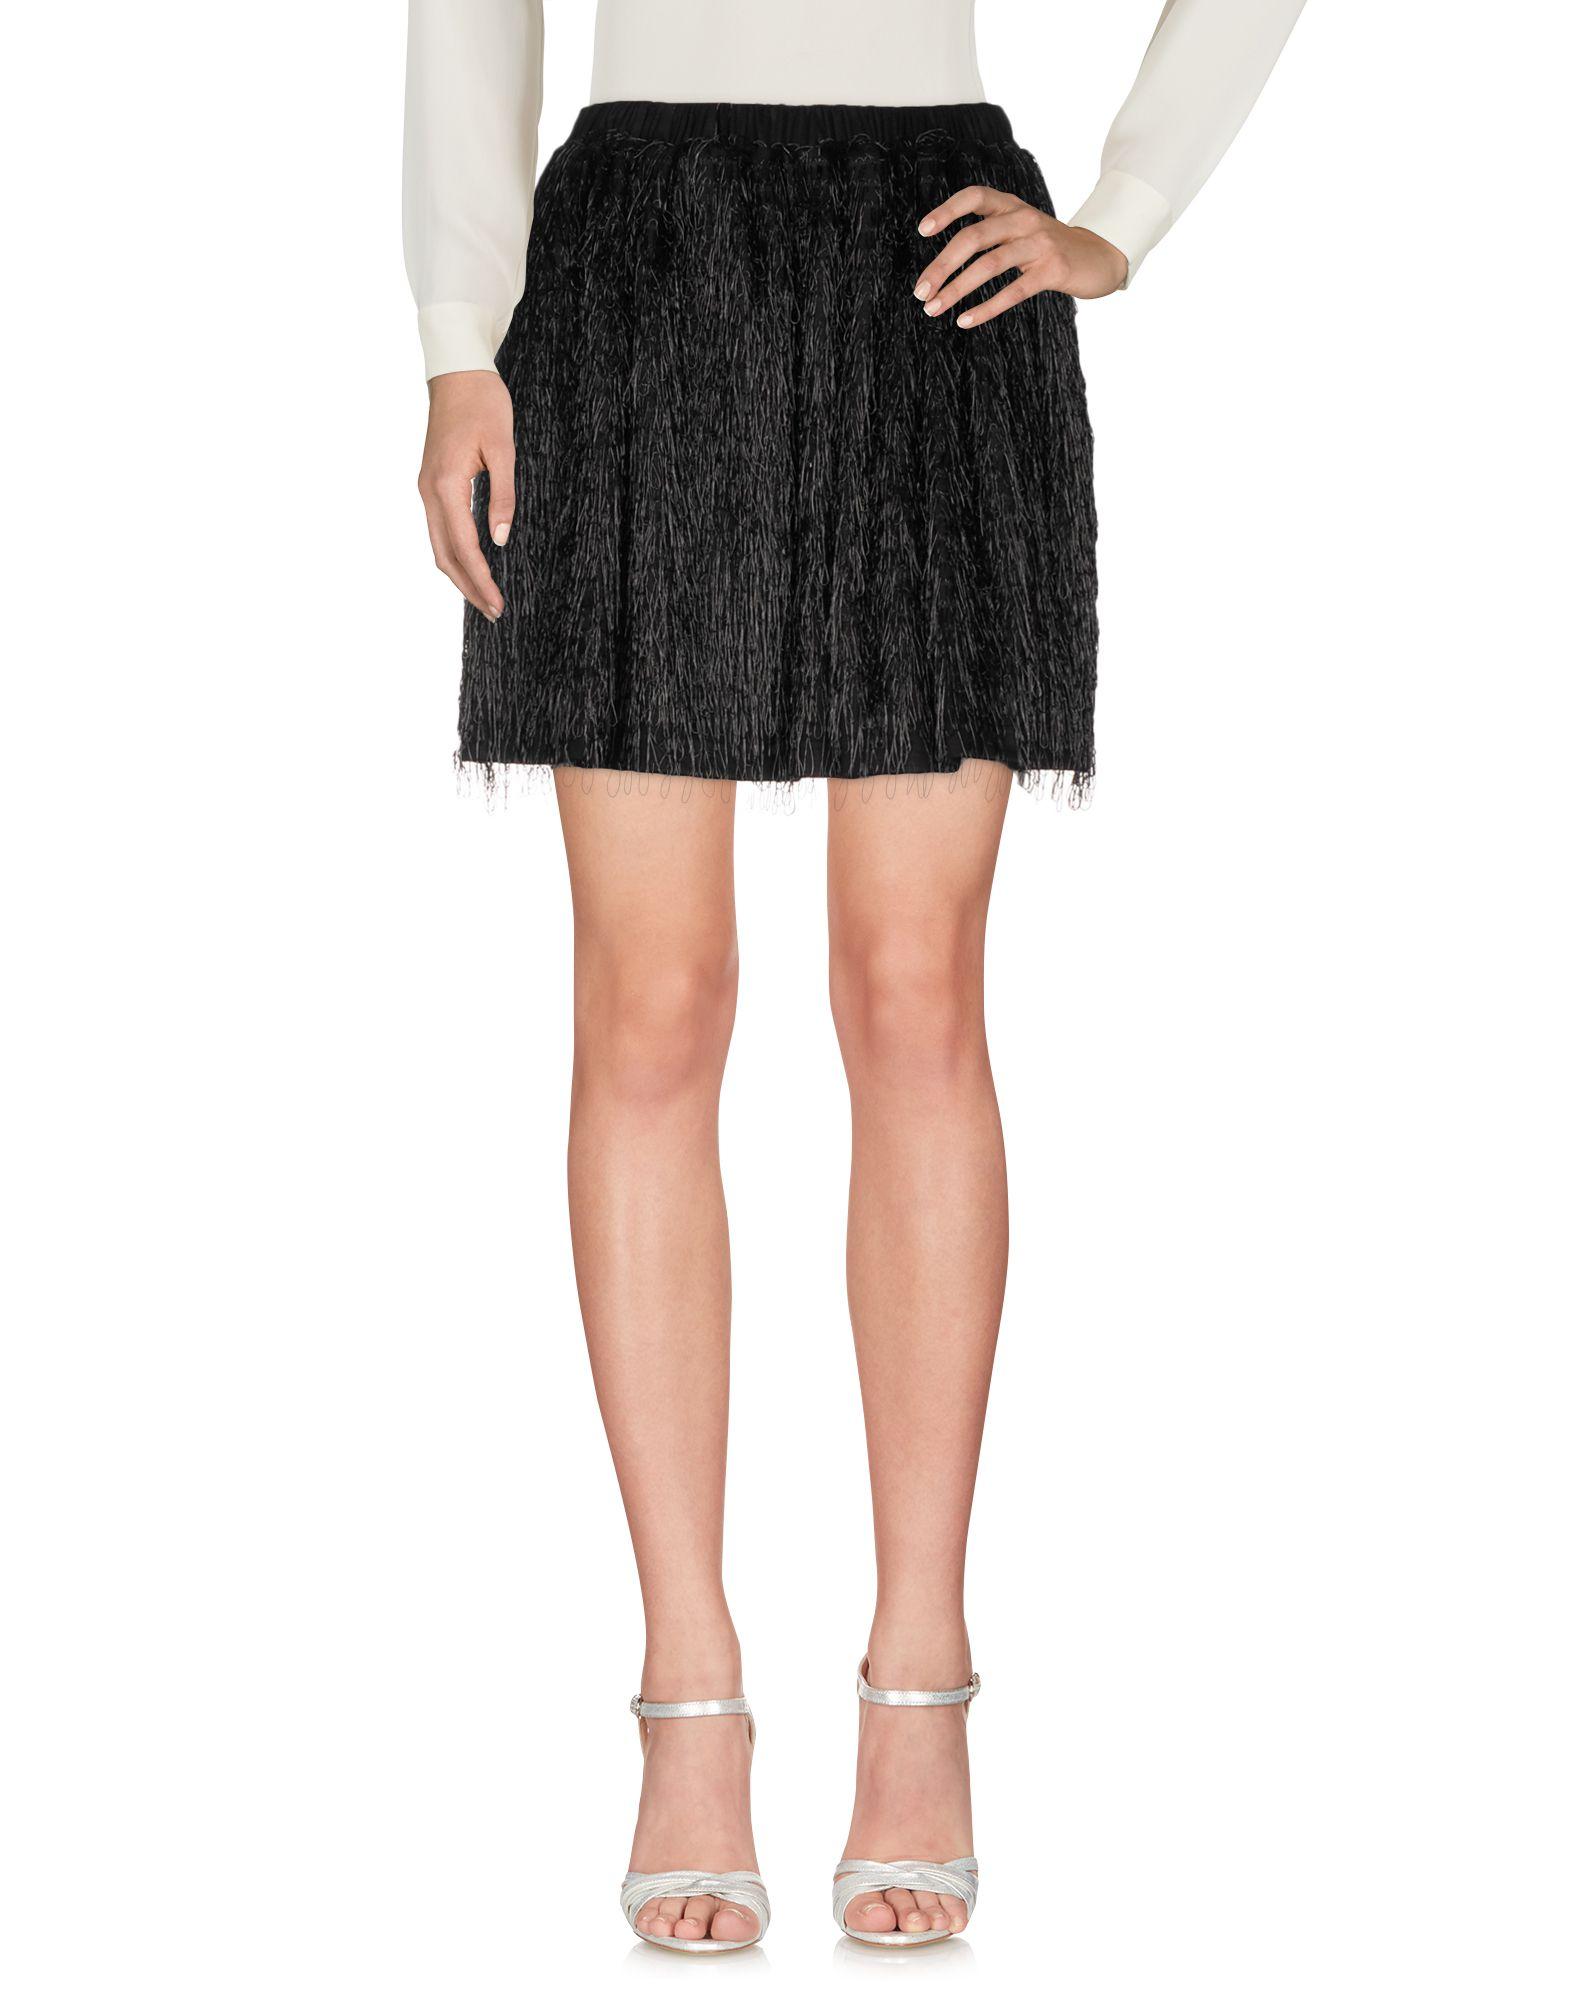 DRESSES - Knee-length dresses Julien David YpvDizG